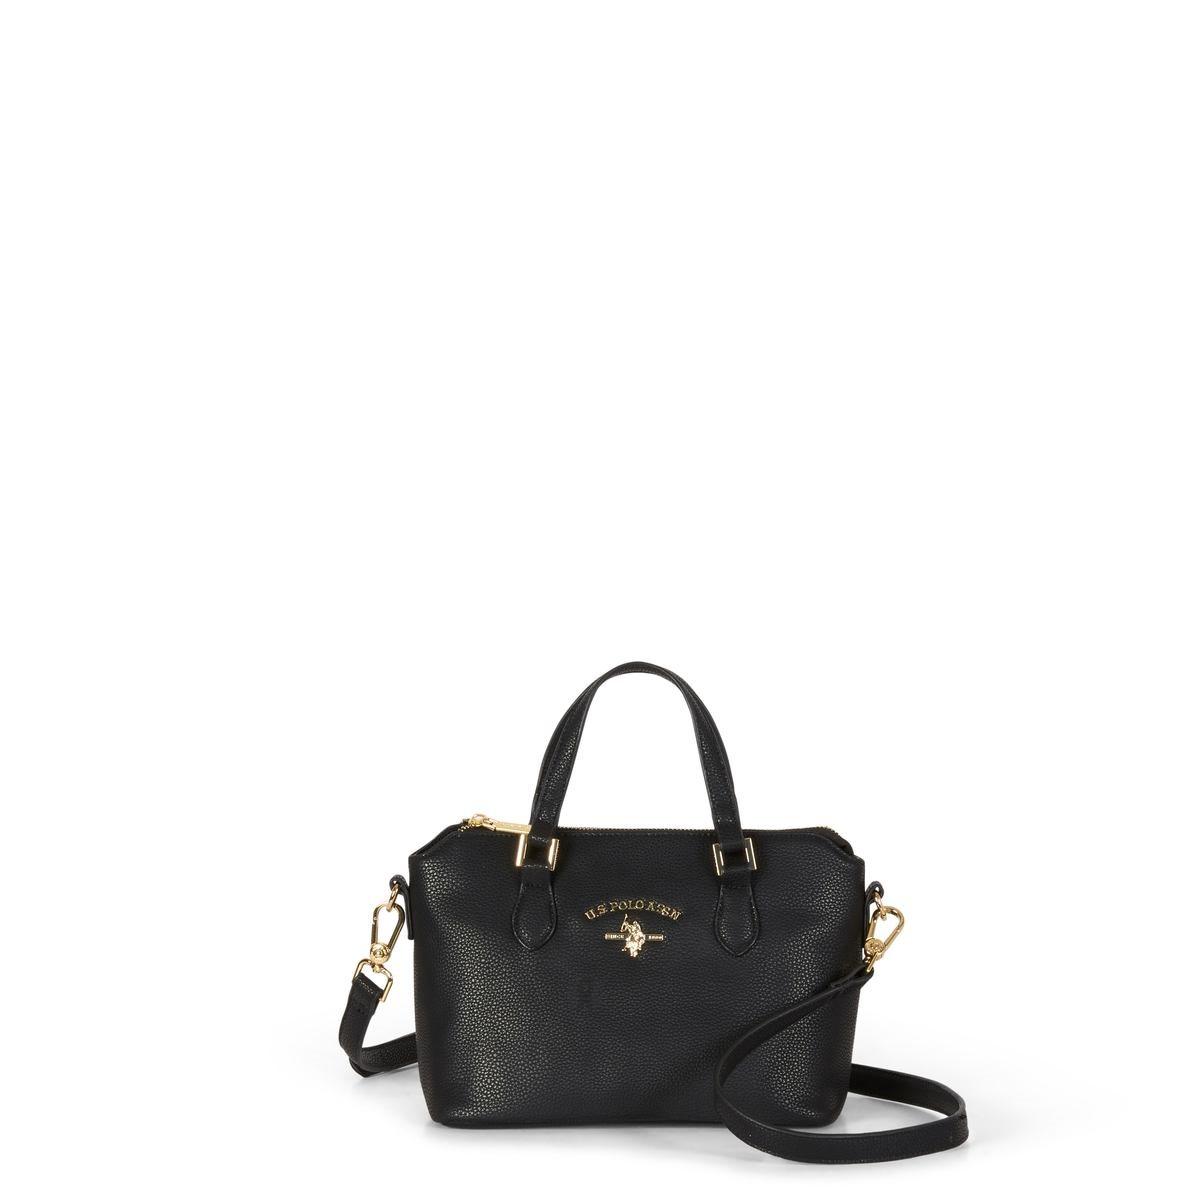 US Polo Assn. Τσάντα χειρός 24x14x18cm Stanford Black